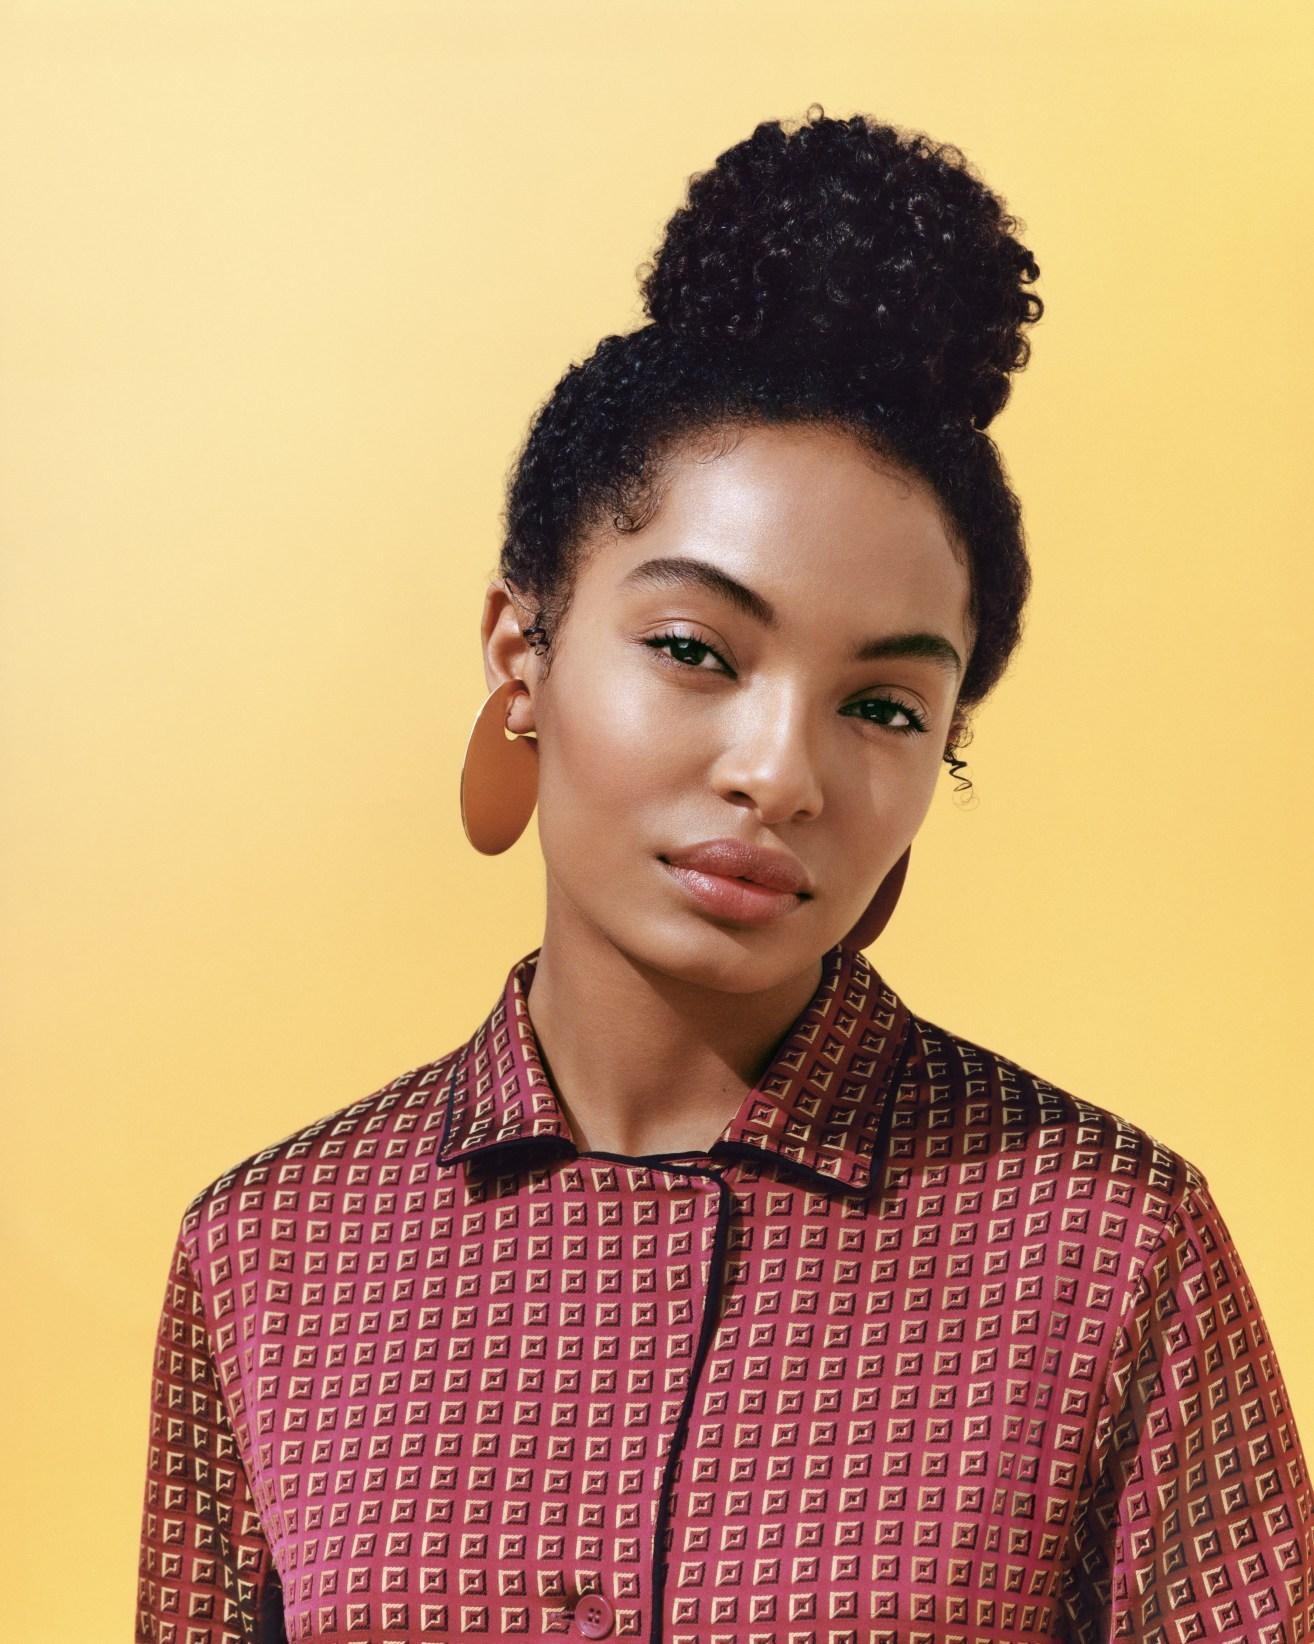 Yara Shahidi Fronts Bobbi Brown's Confident Beauty